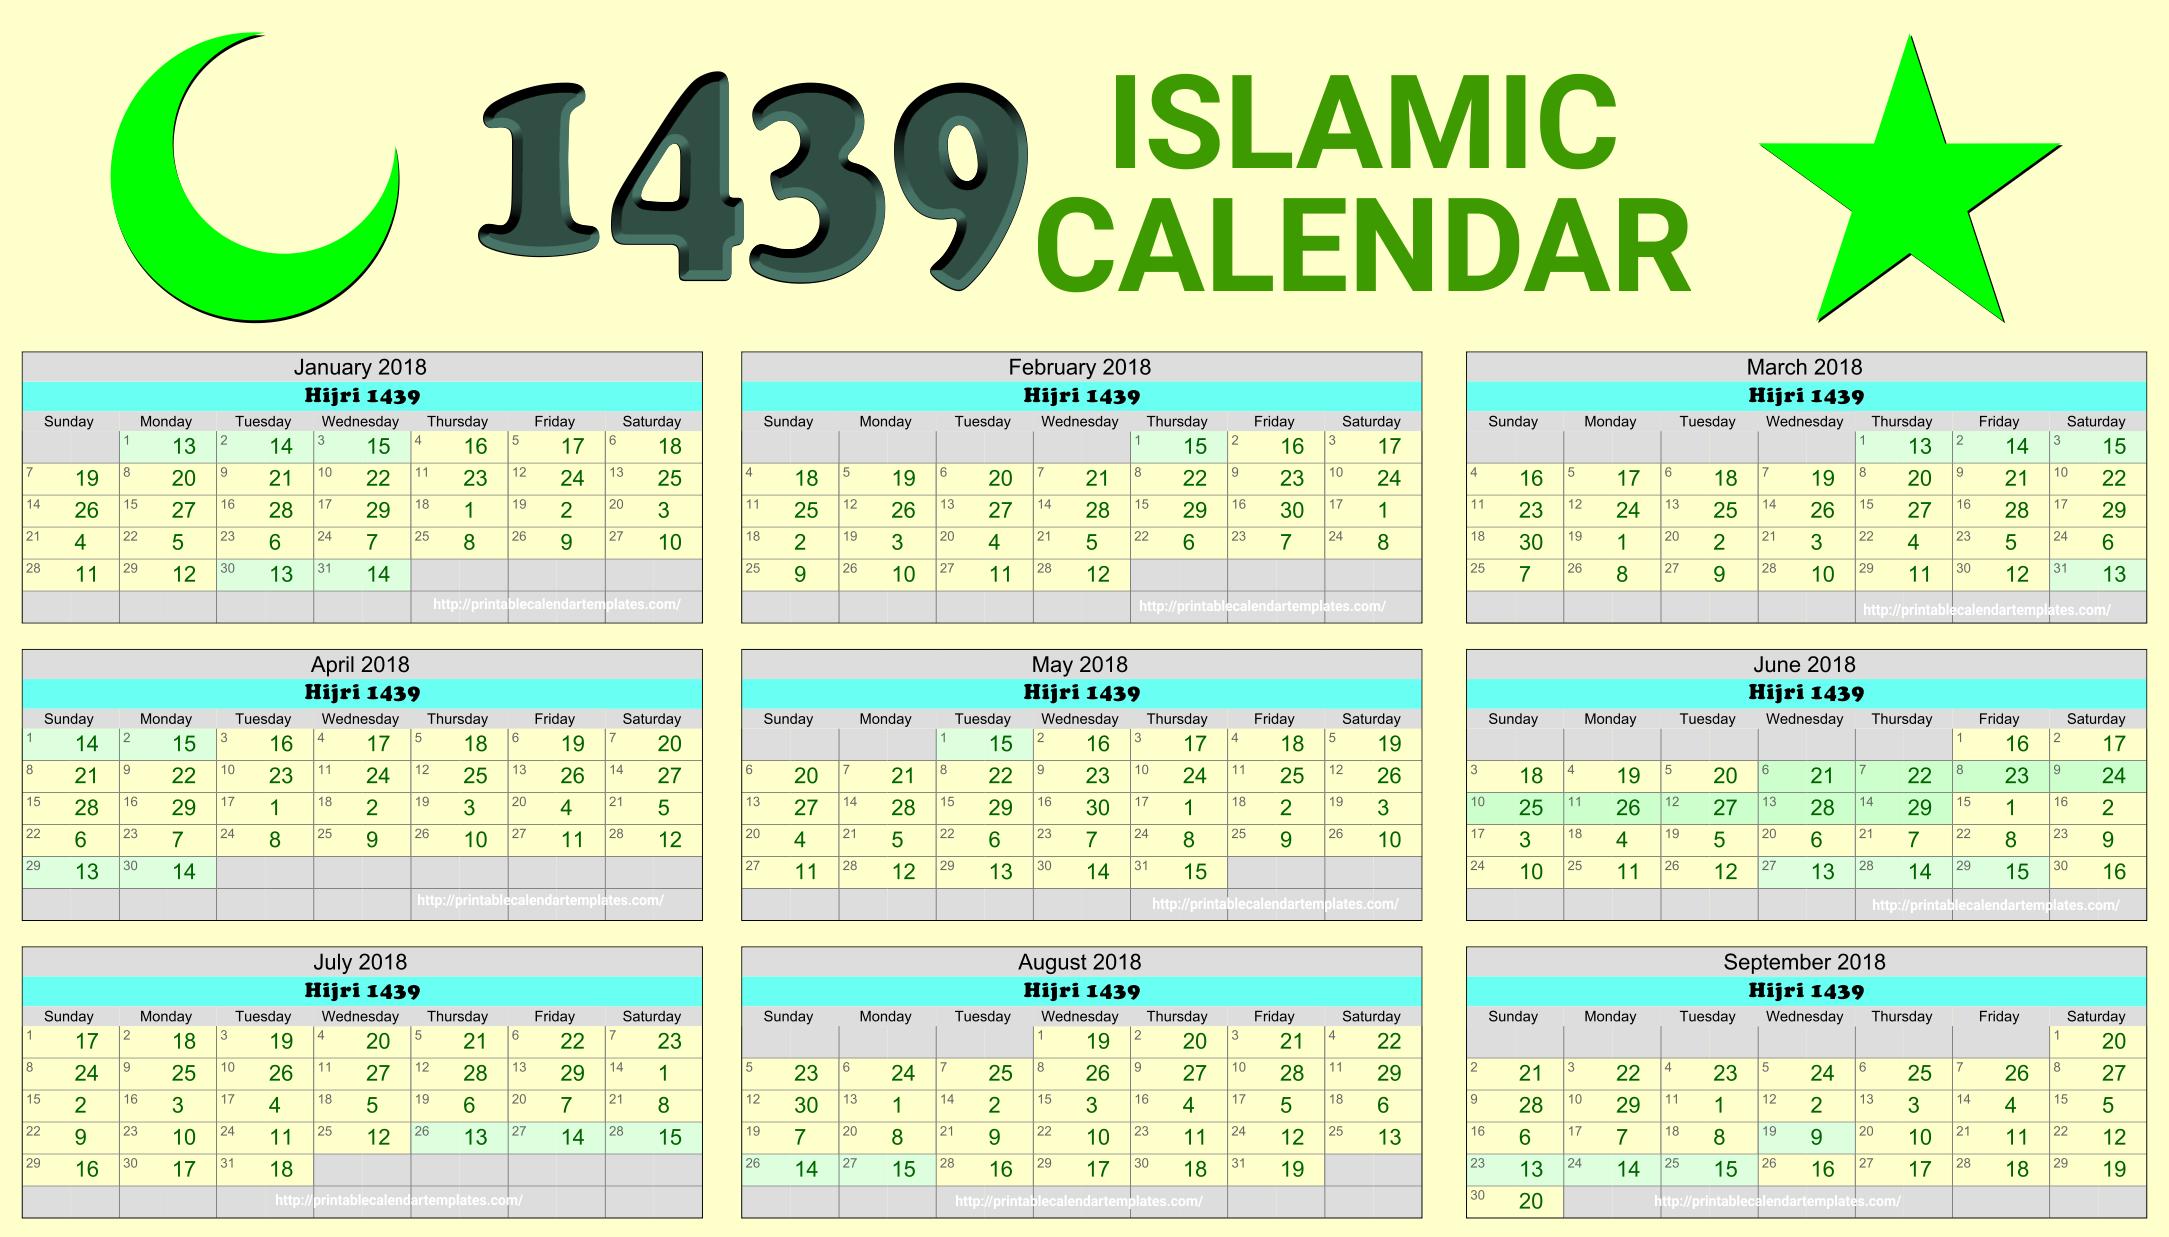 Ramzan Calendar 2018 Islamic Calendar Hijri Calendar Marketing Calendar Template